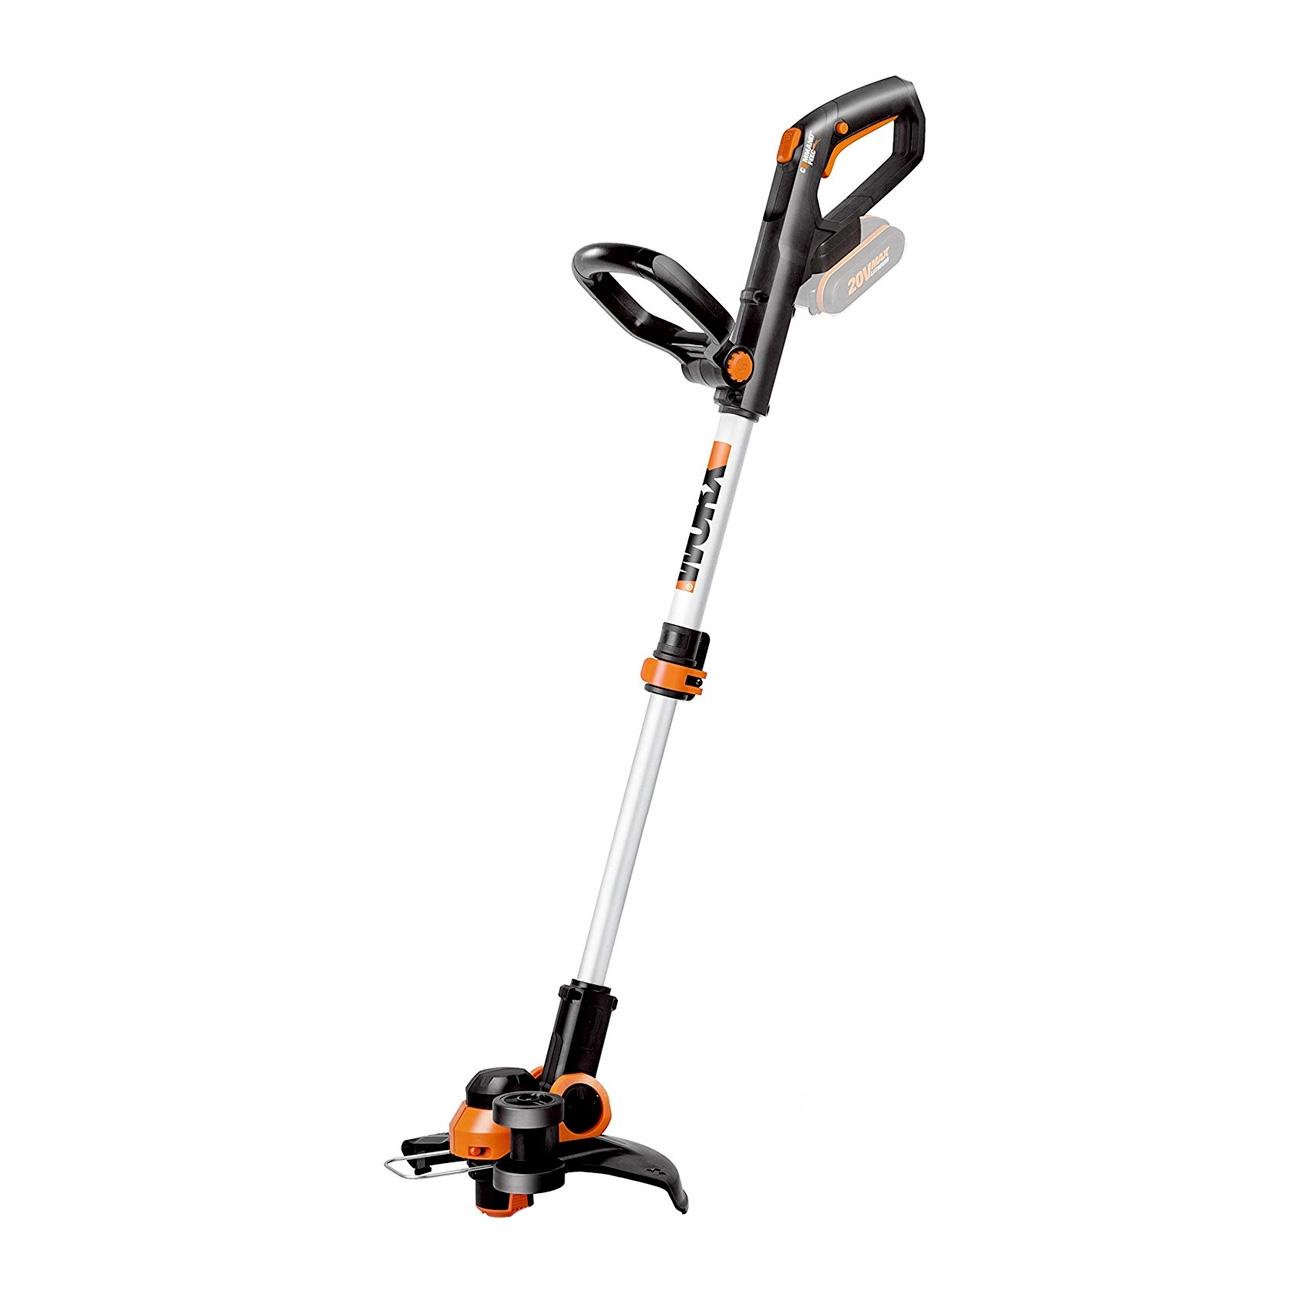 Worx WG163E.9 Cordless grass trimmer